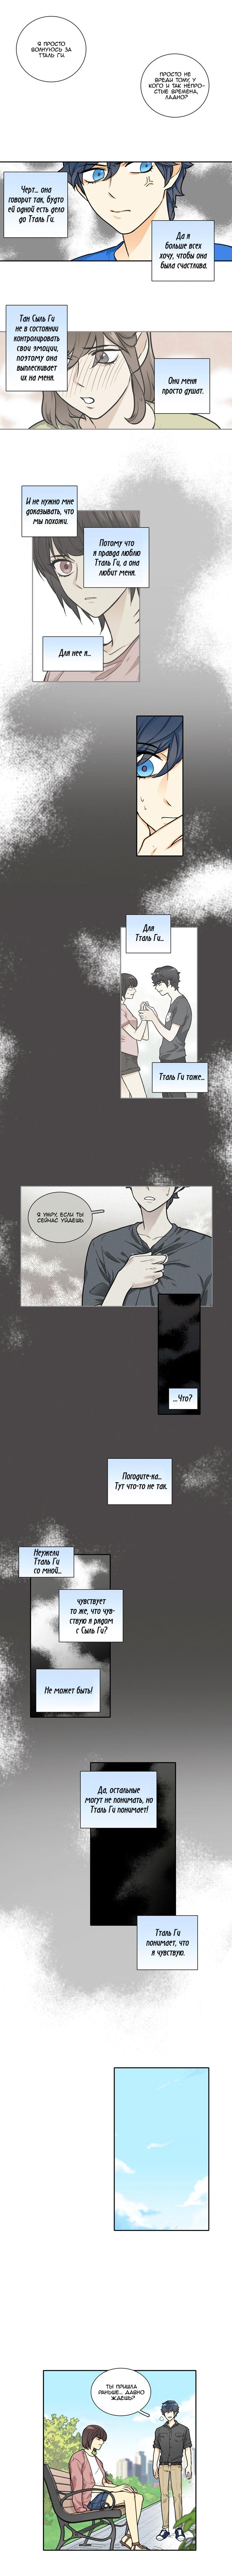 https://r1.ninemanga.com/comics/pic2/41/21609/313960/148095123811.jpg Page 6